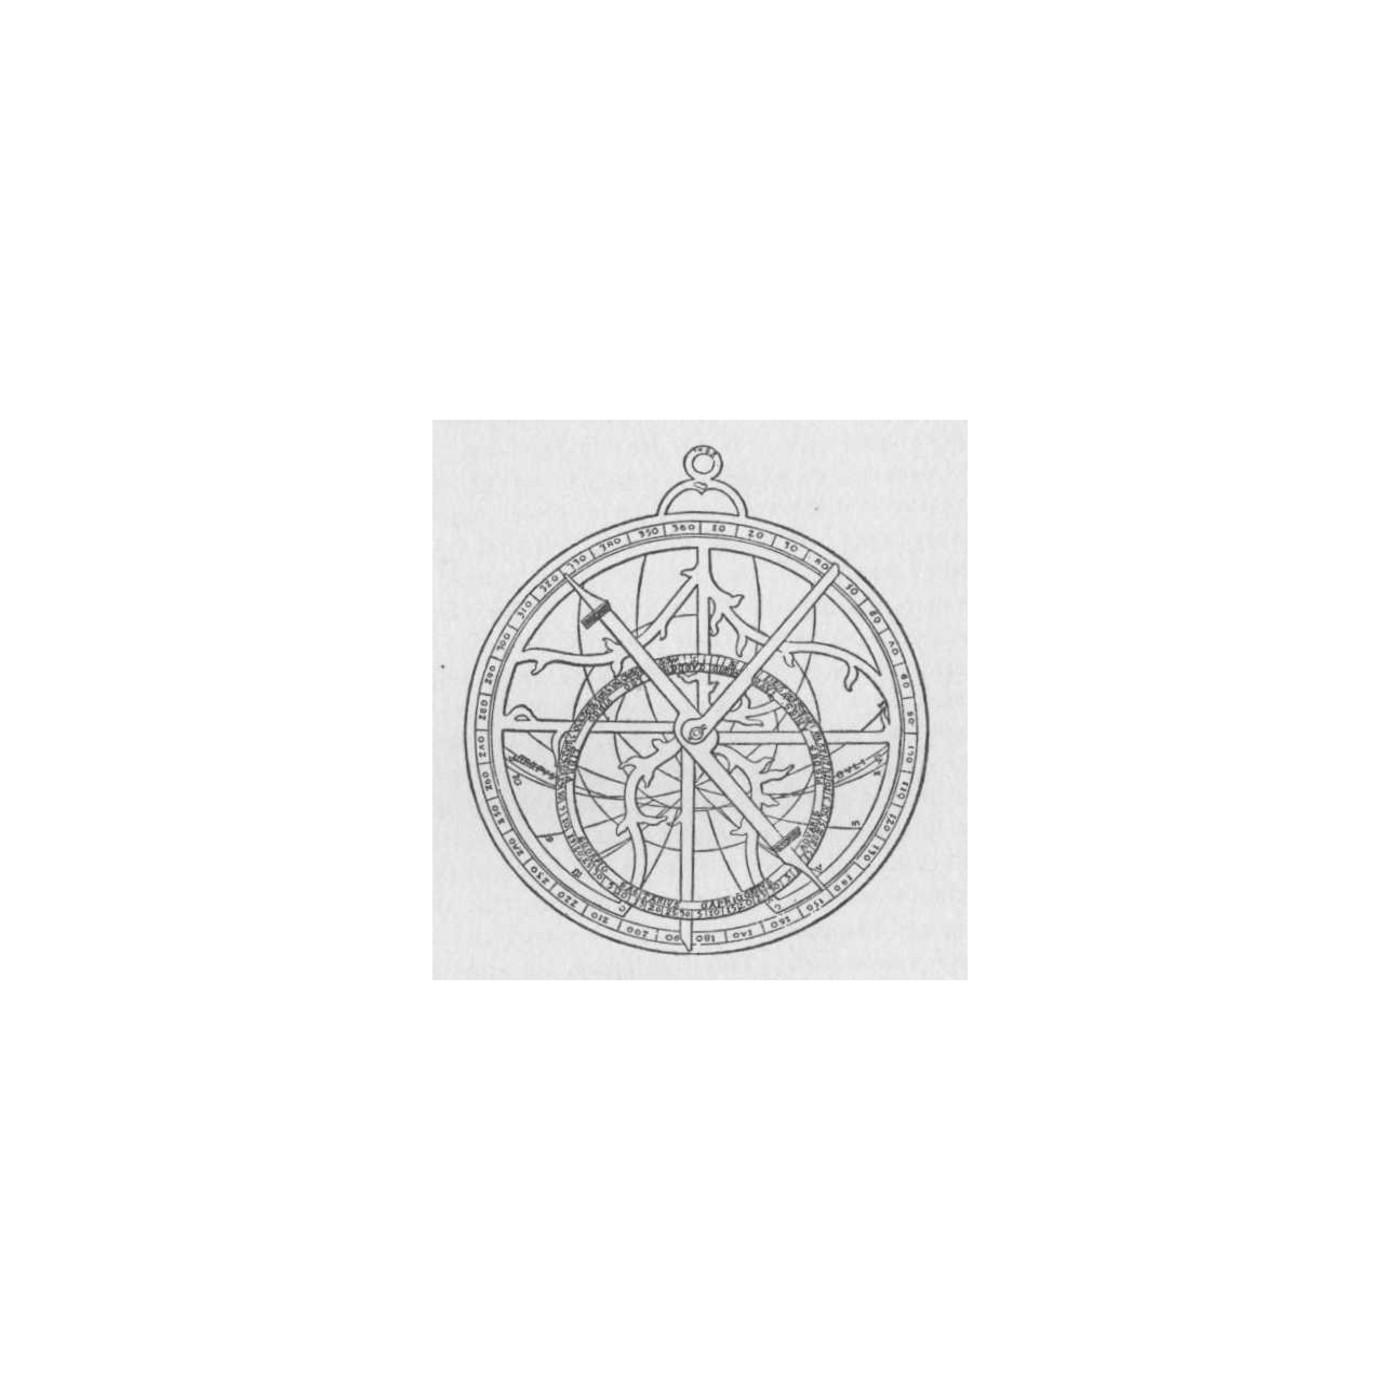 <![CDATA[El Astrolabio]]>